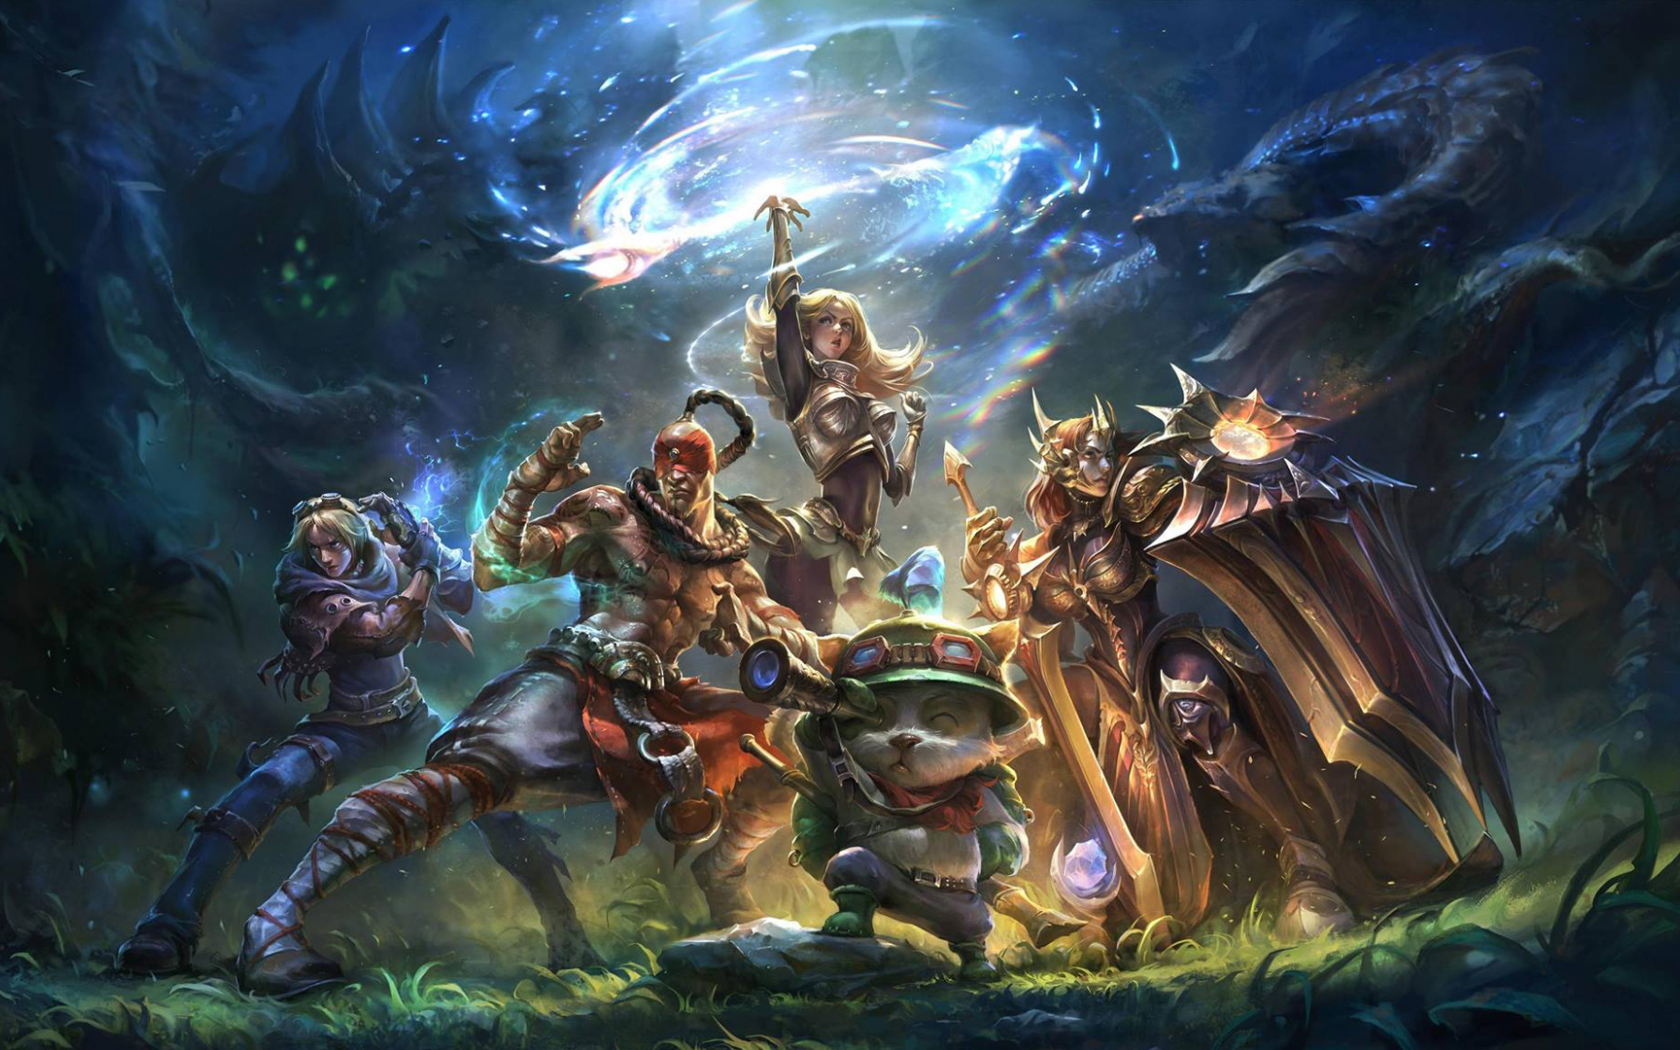 Free Download Teemo Lux Lee Sin Ezreal Leona League Of Legends